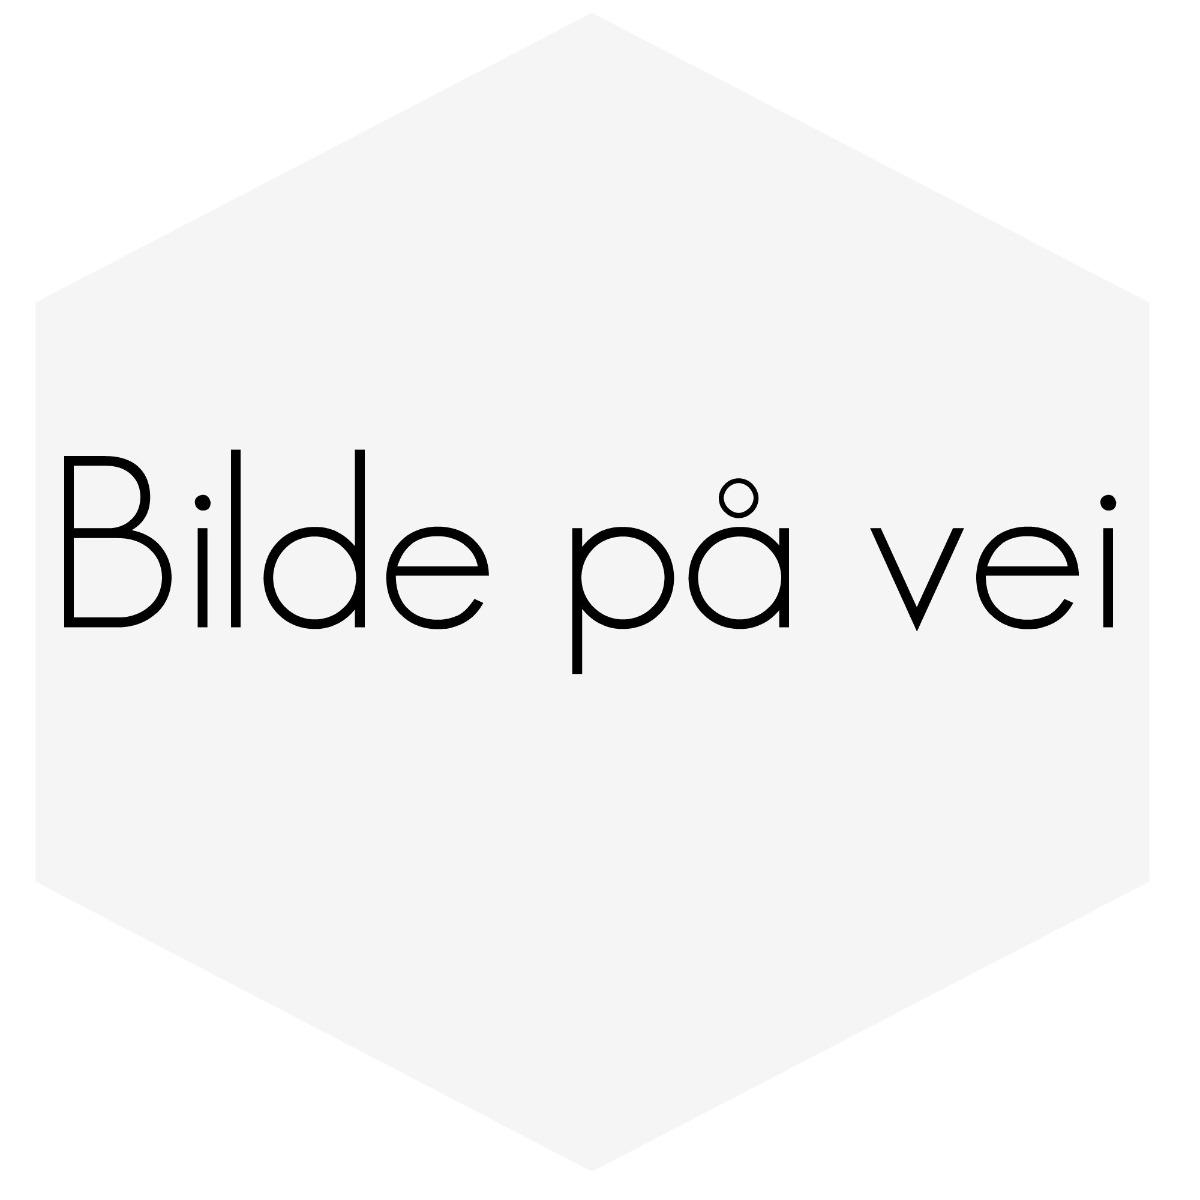 "SILIKONSLANGE RØD REDUSERING 2,375-2,75"" (60-70MM)"